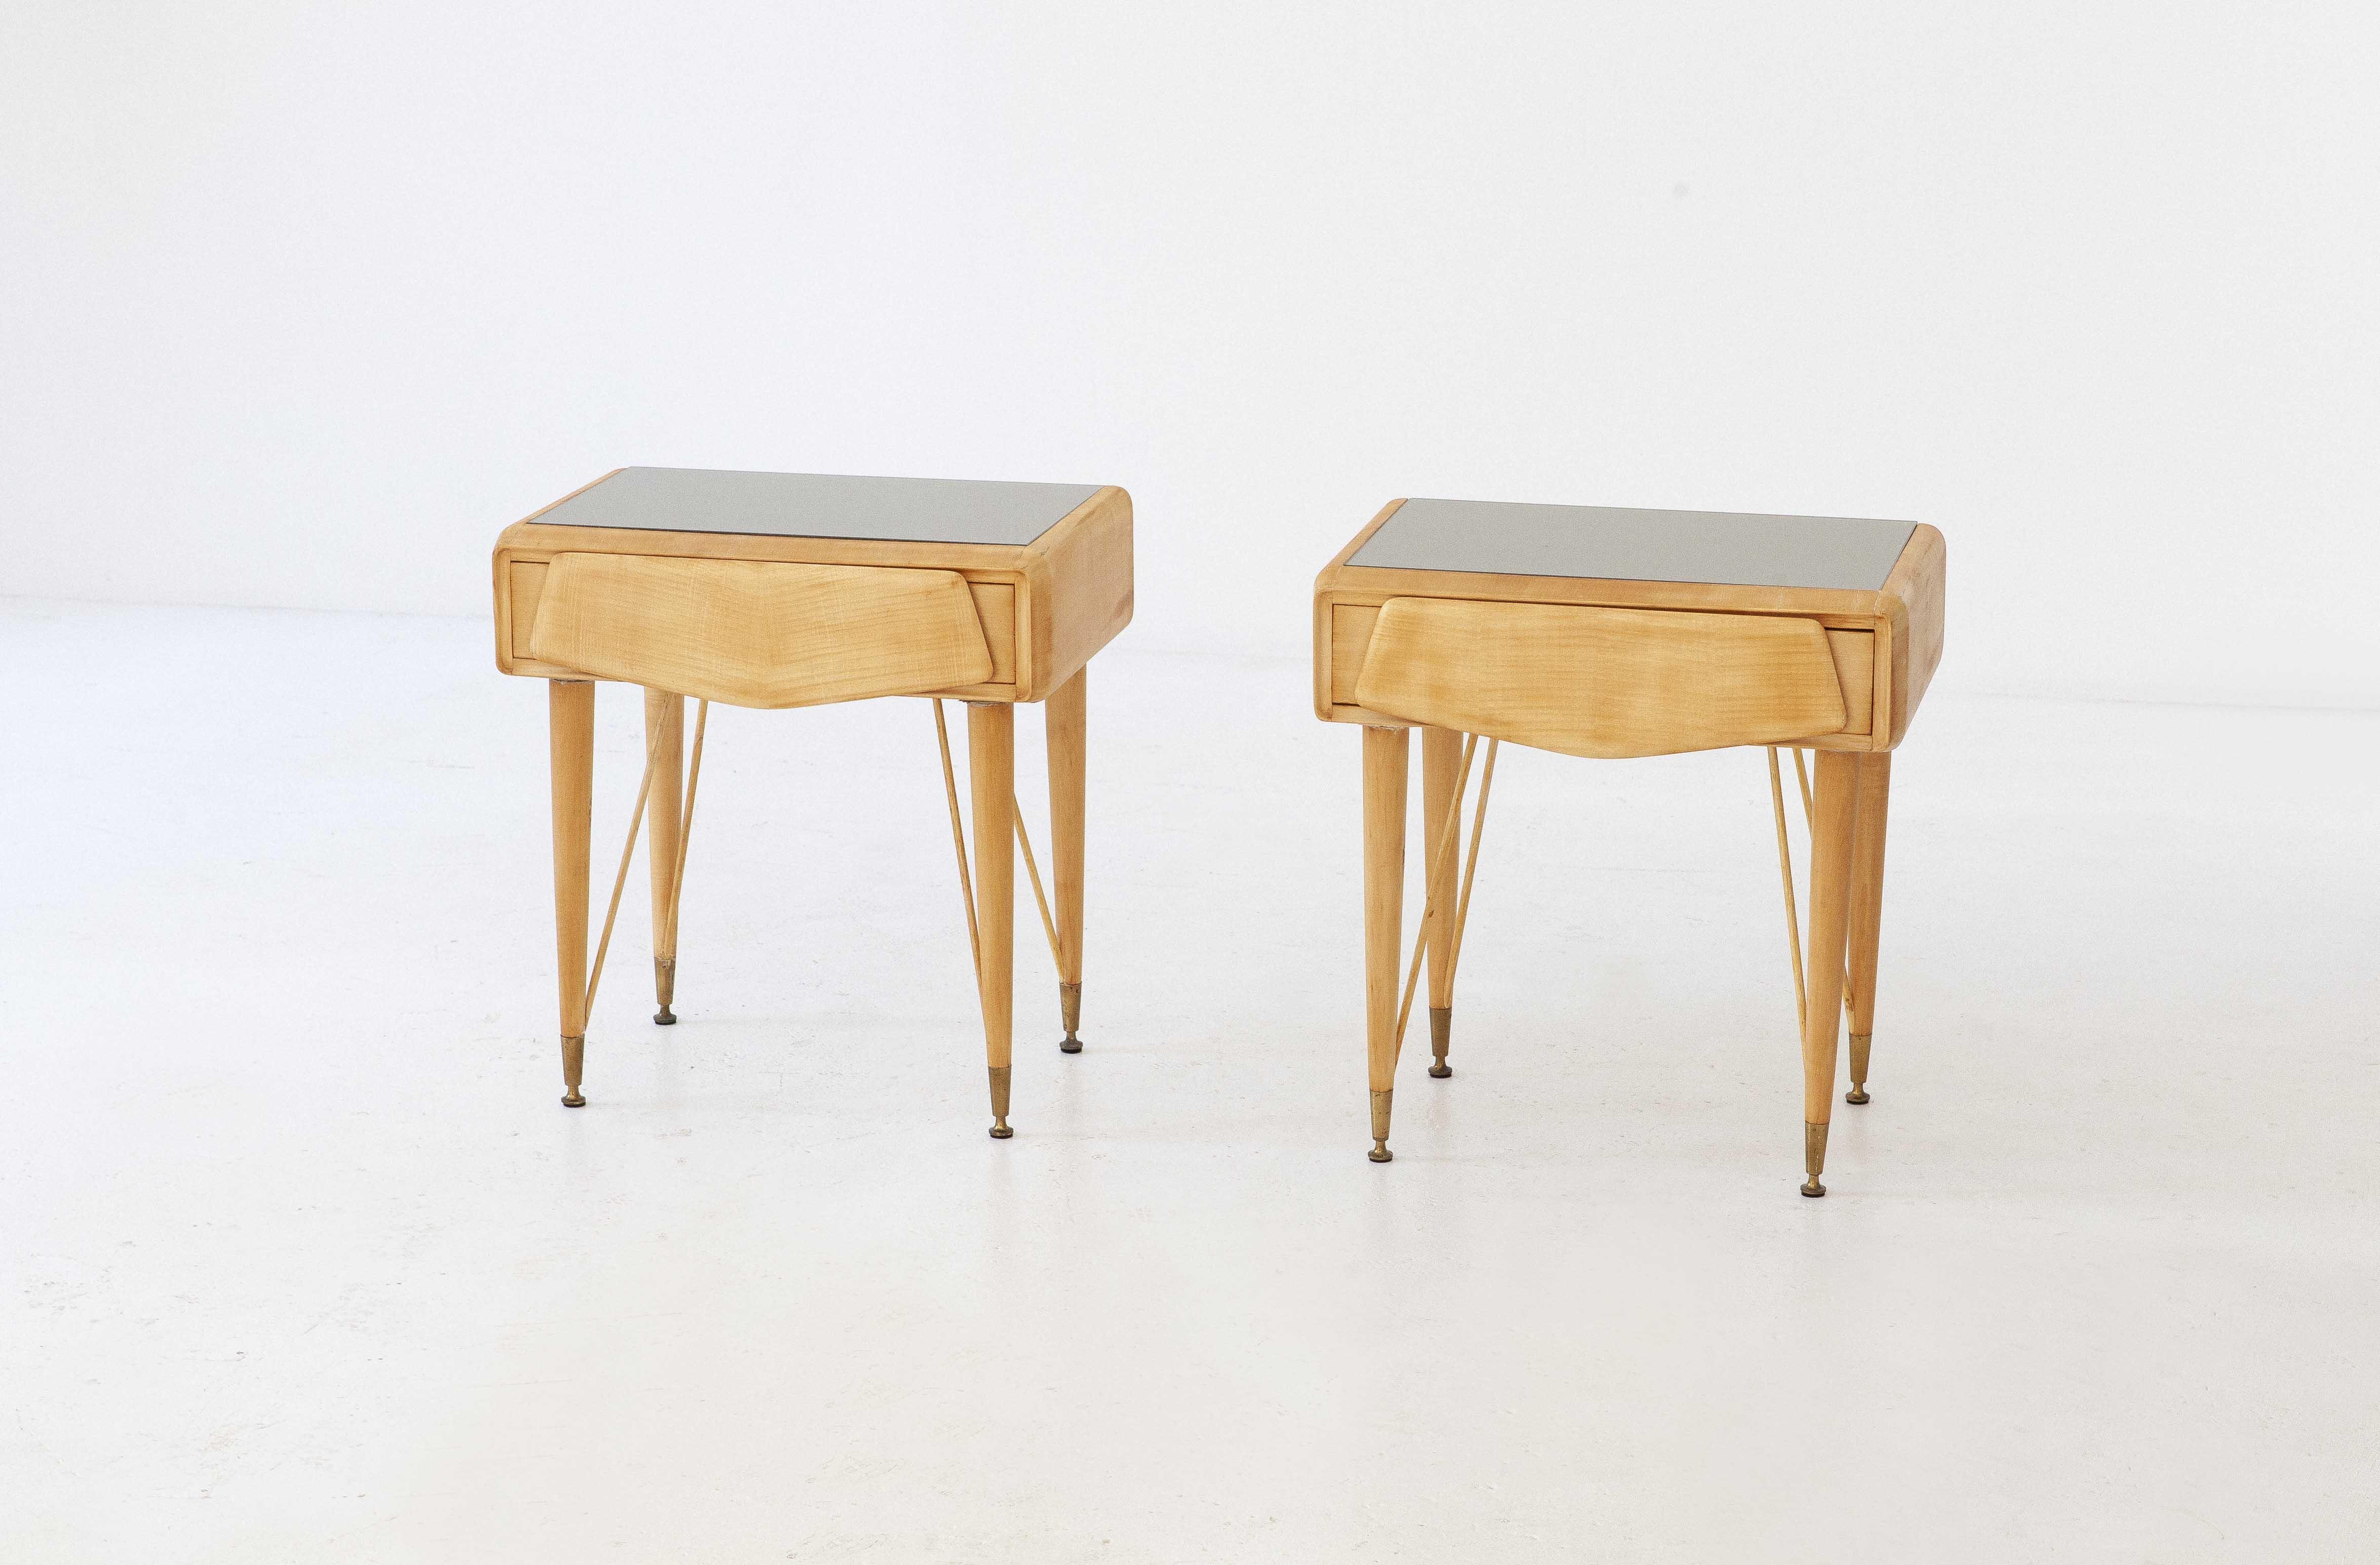 italian-mable-wood-glass-brass-bedside-tables-6-BT77